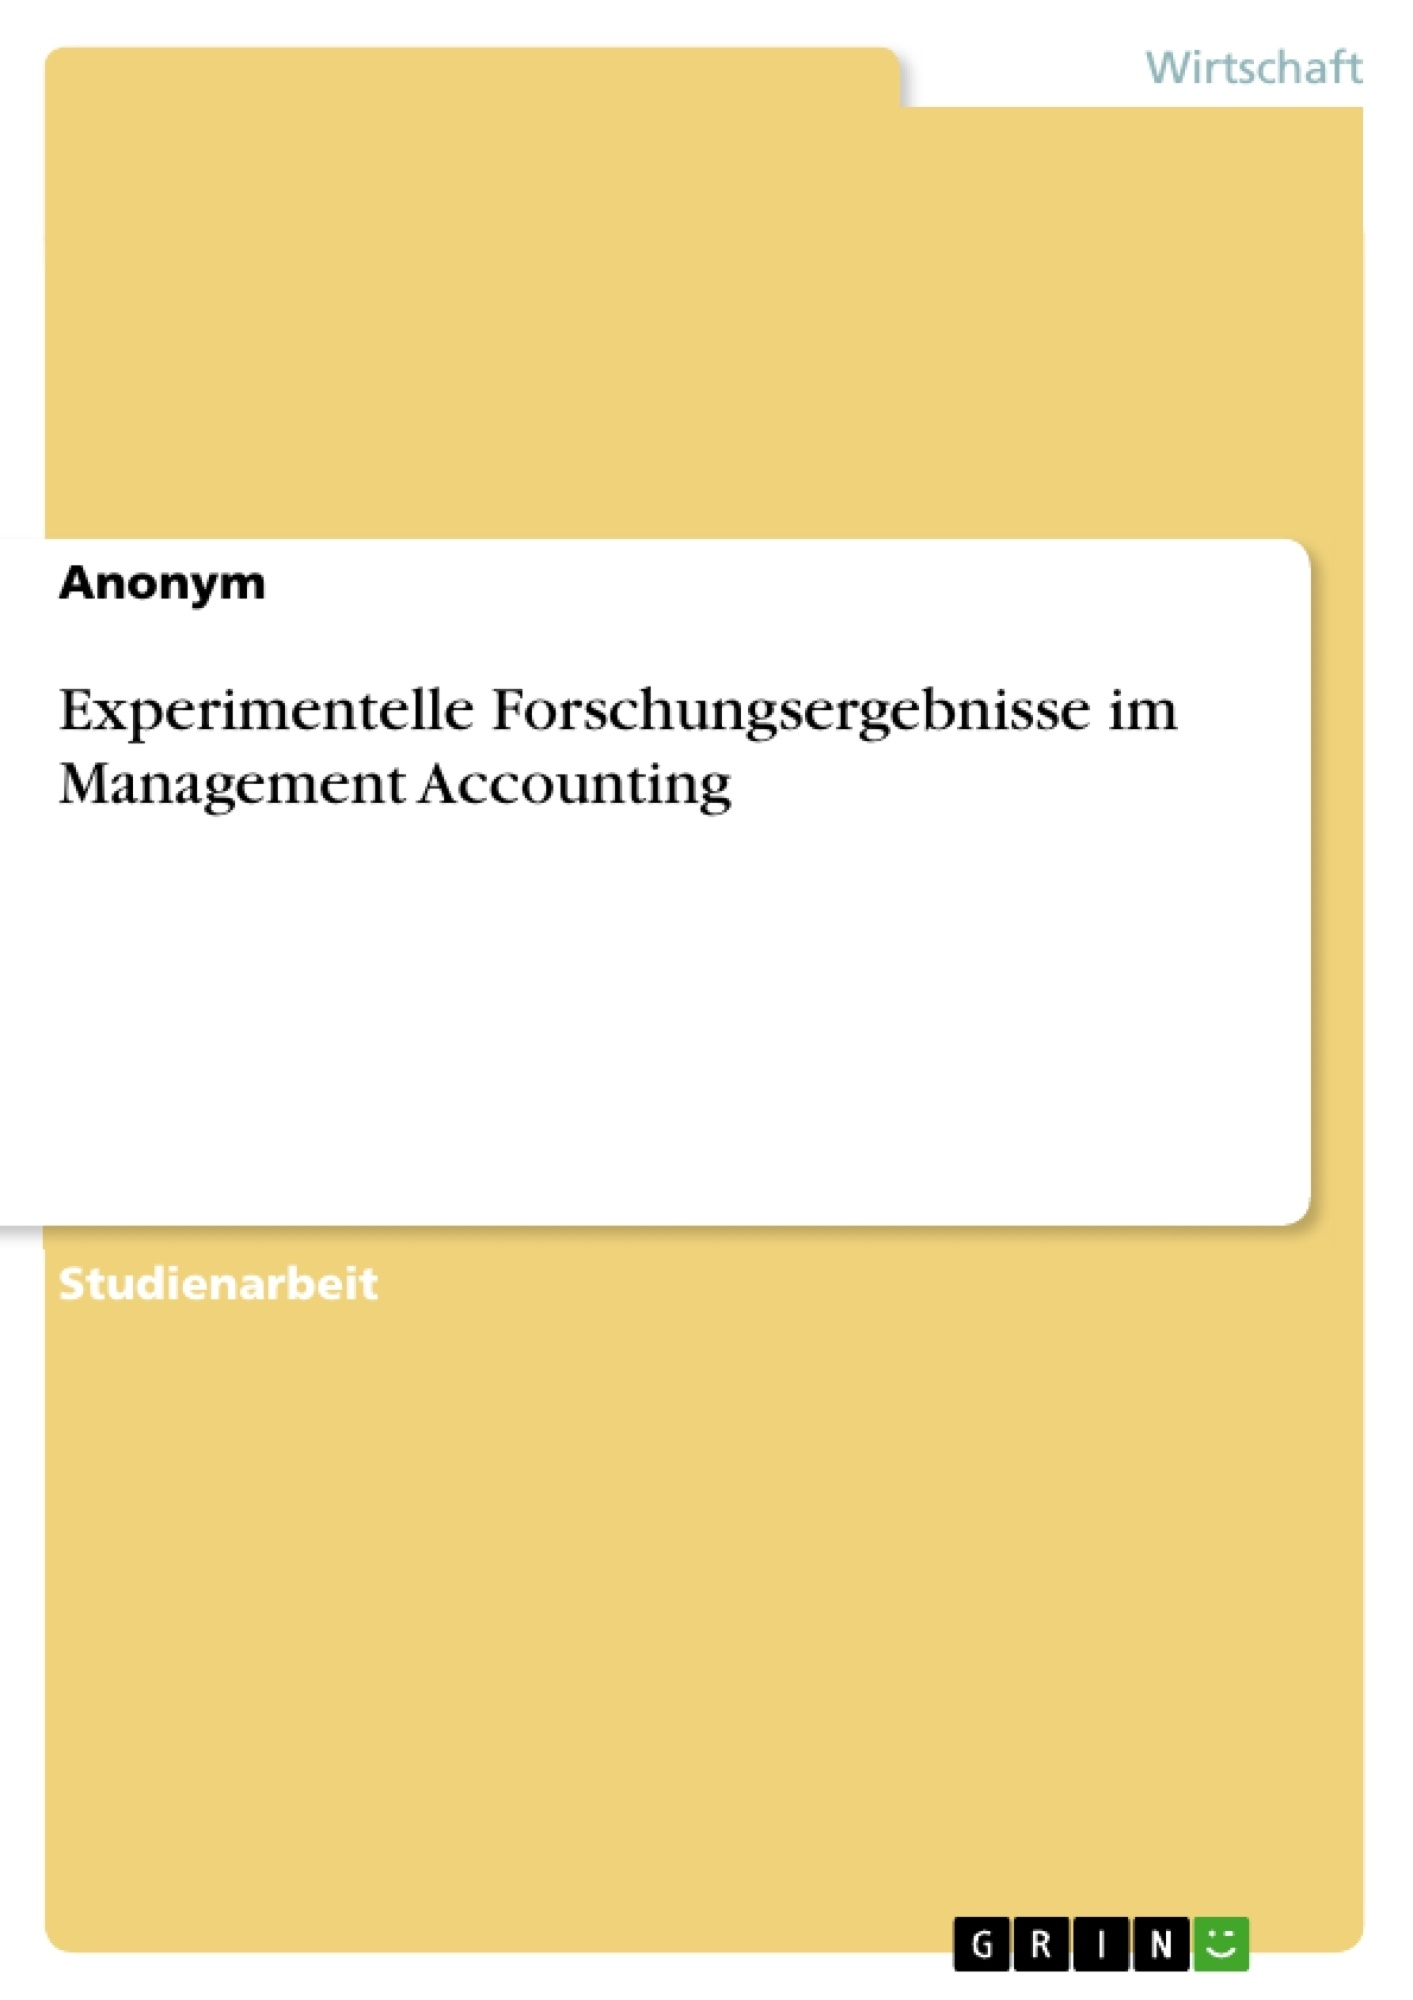 Titel: Experimentelle Forschungsergebnisse im Management Accounting